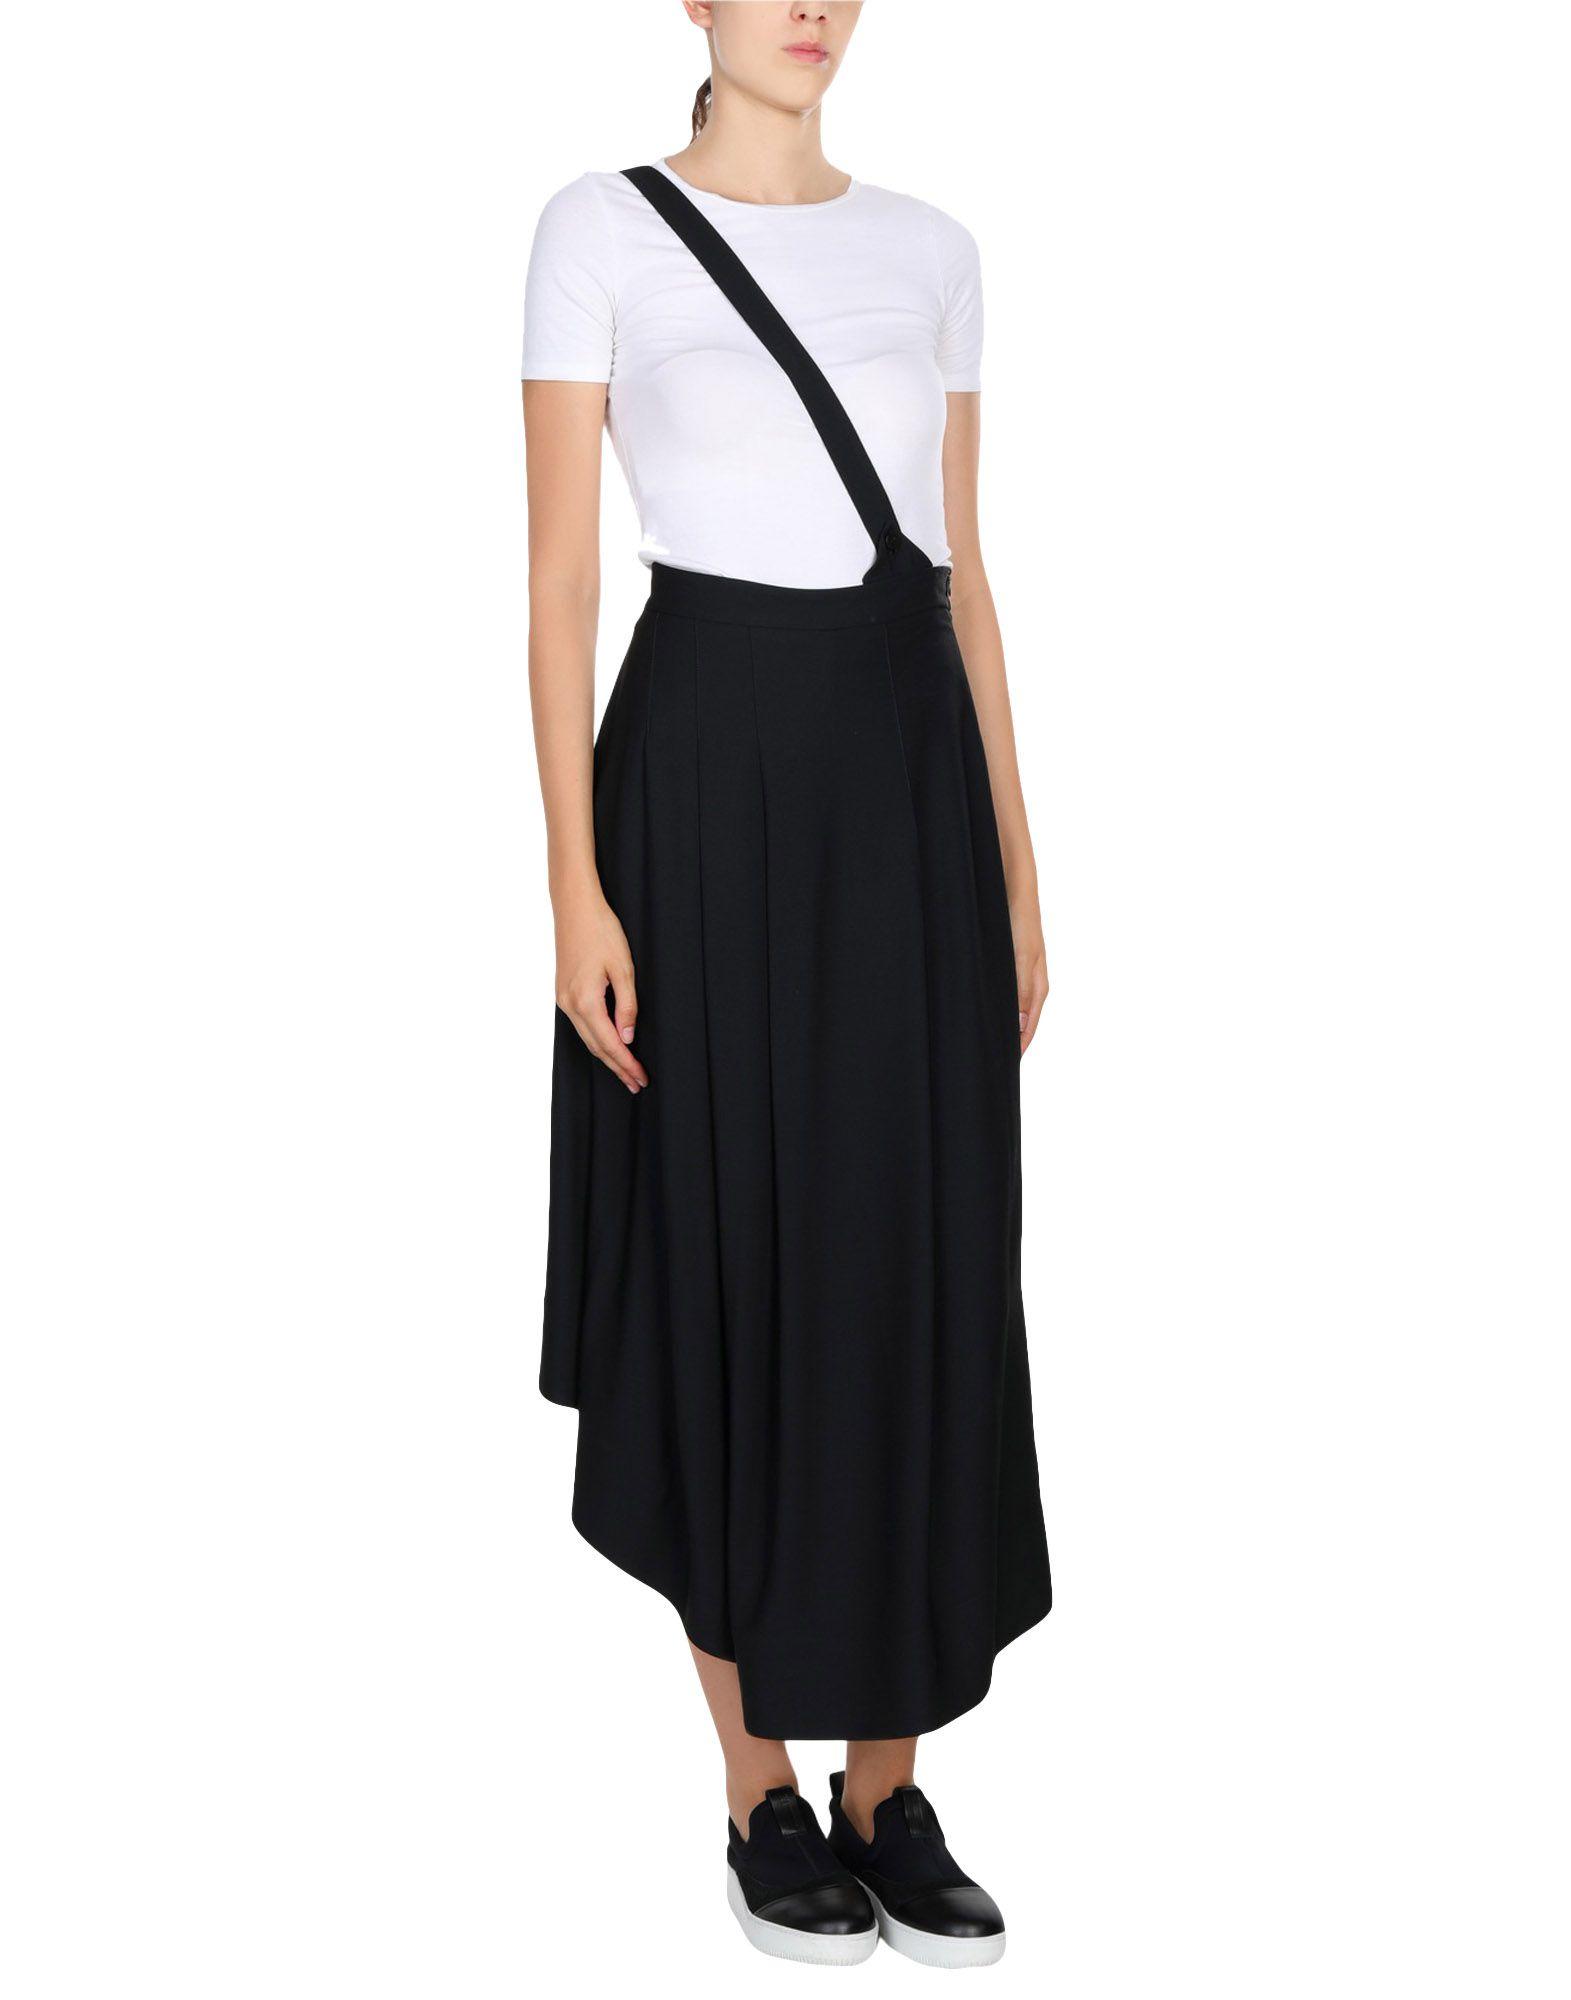 ISABEL BENENATO Юбка длиной 3/4 moschino couture юбка длиной 3 4